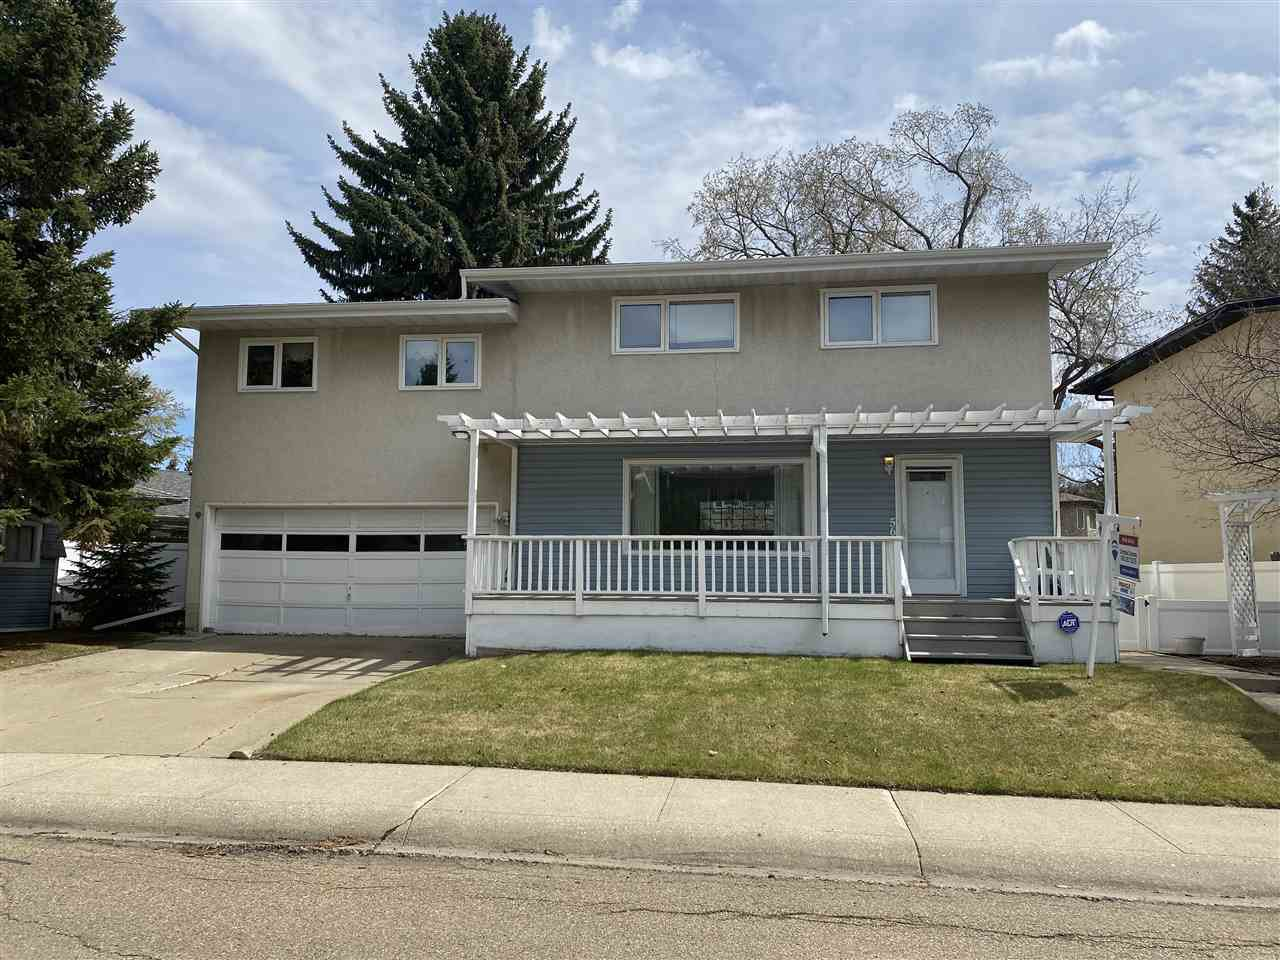 Main Photo: 5603 108 Street in Edmonton: Zone 15 House for sale : MLS®# E4196391